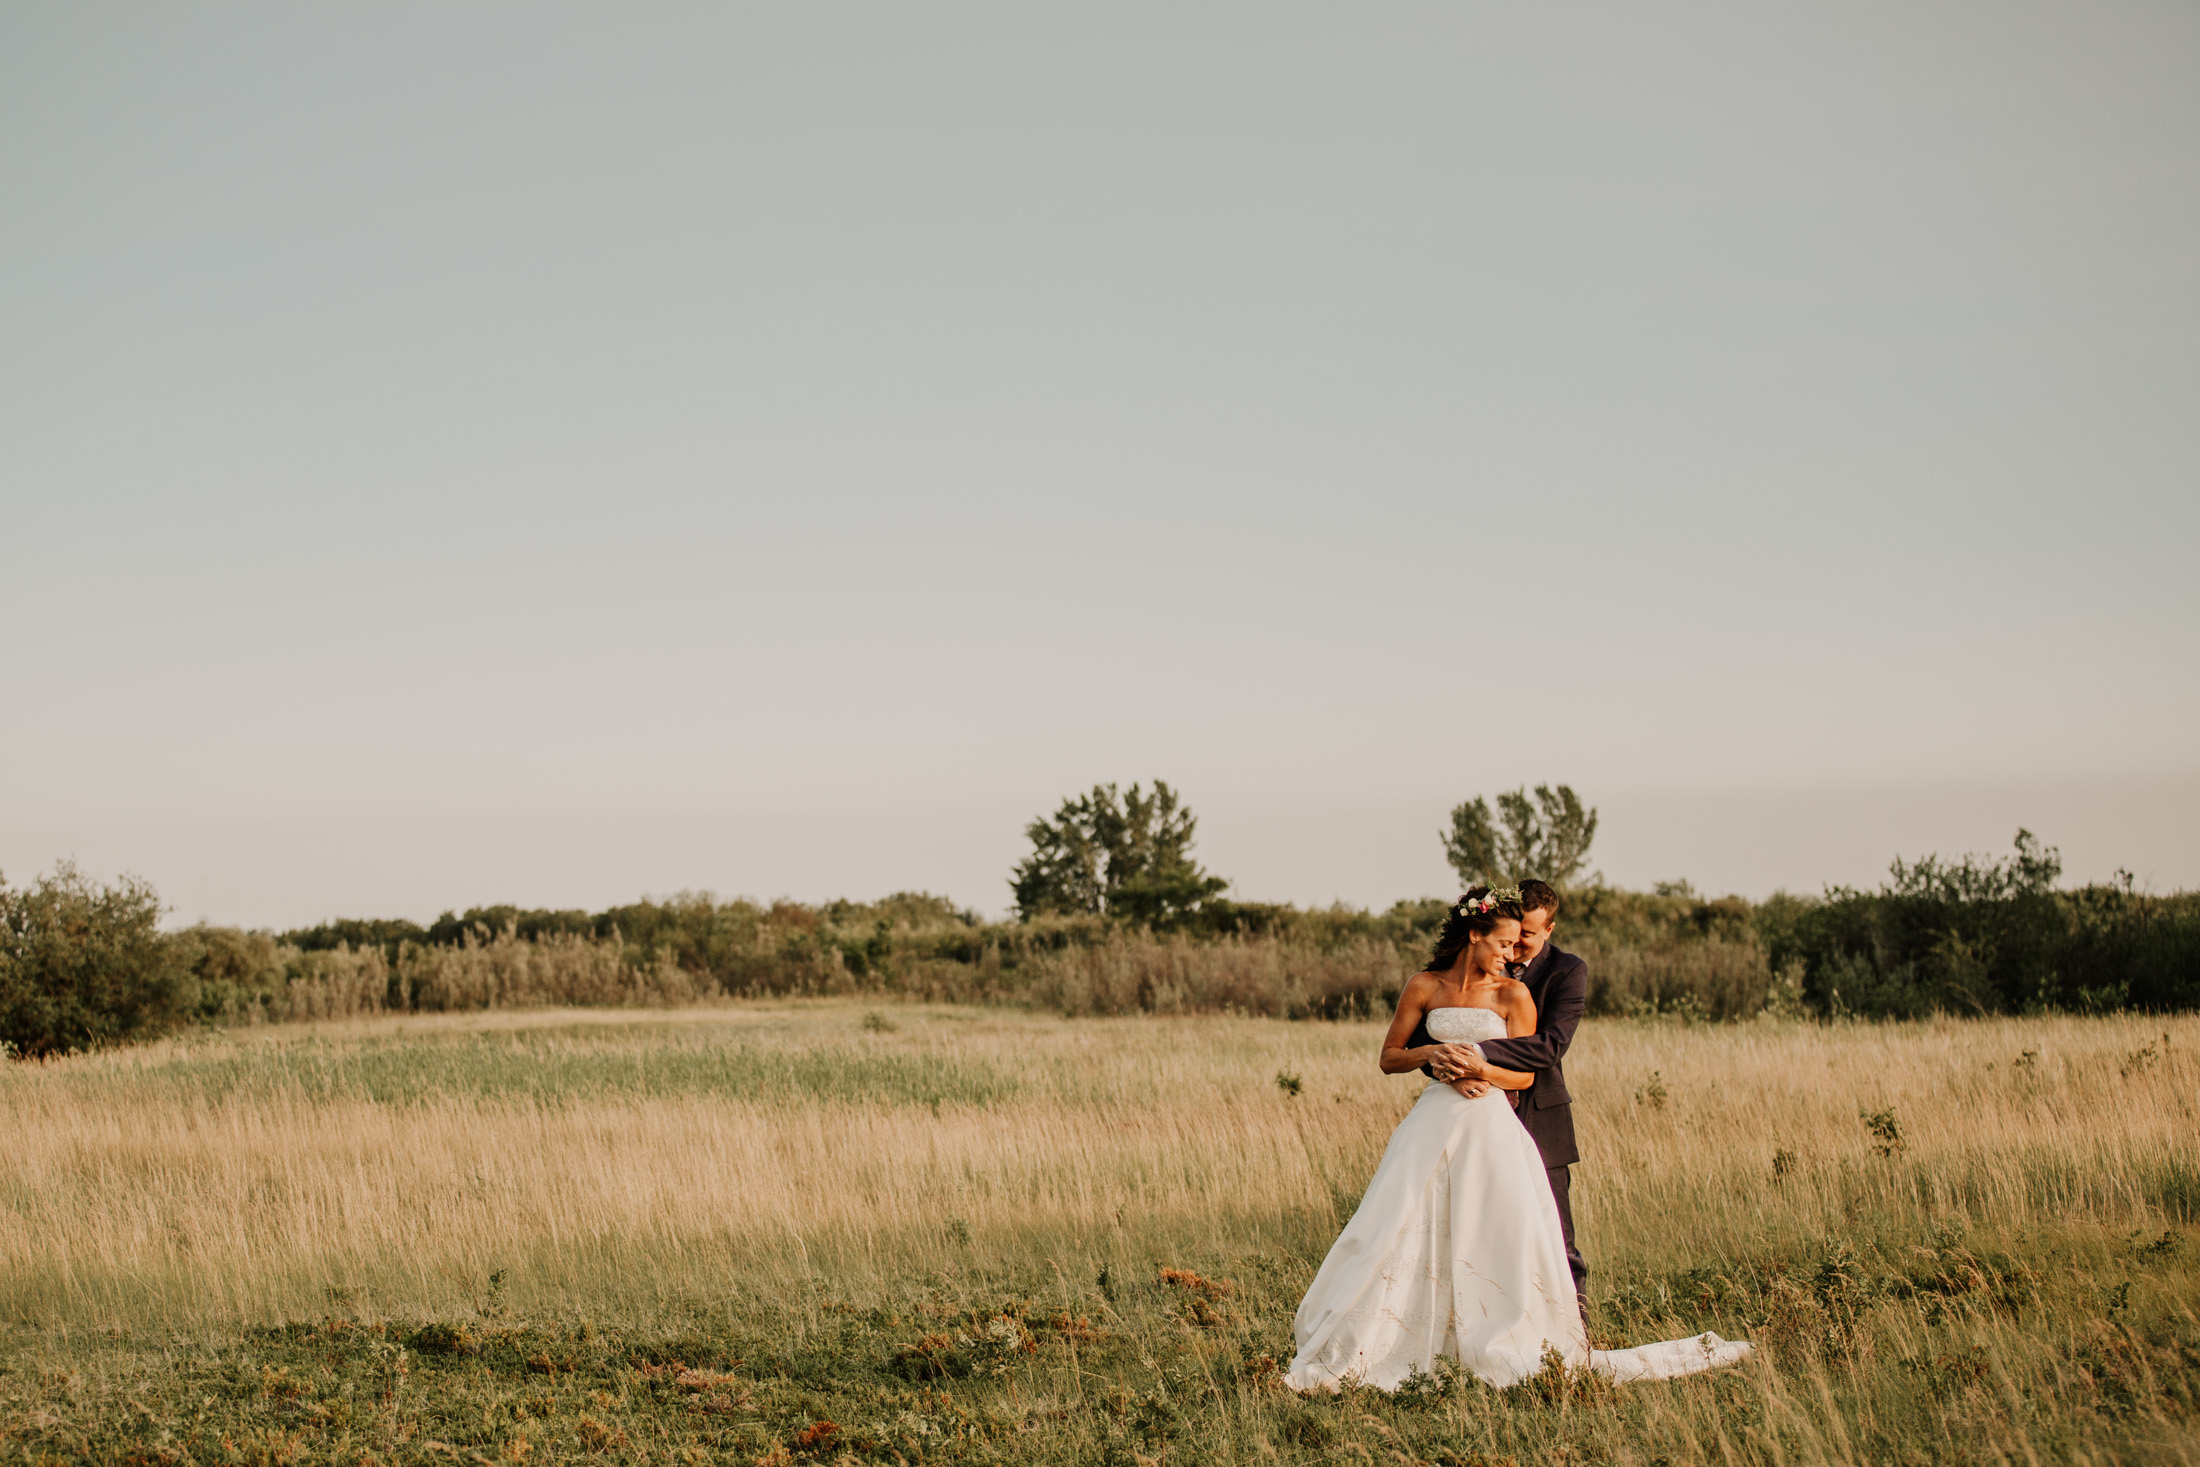 EnsoulEndearmentImagery-WeddingAnniversary-SaskatoonWeddingPhotographer-7451.jpg